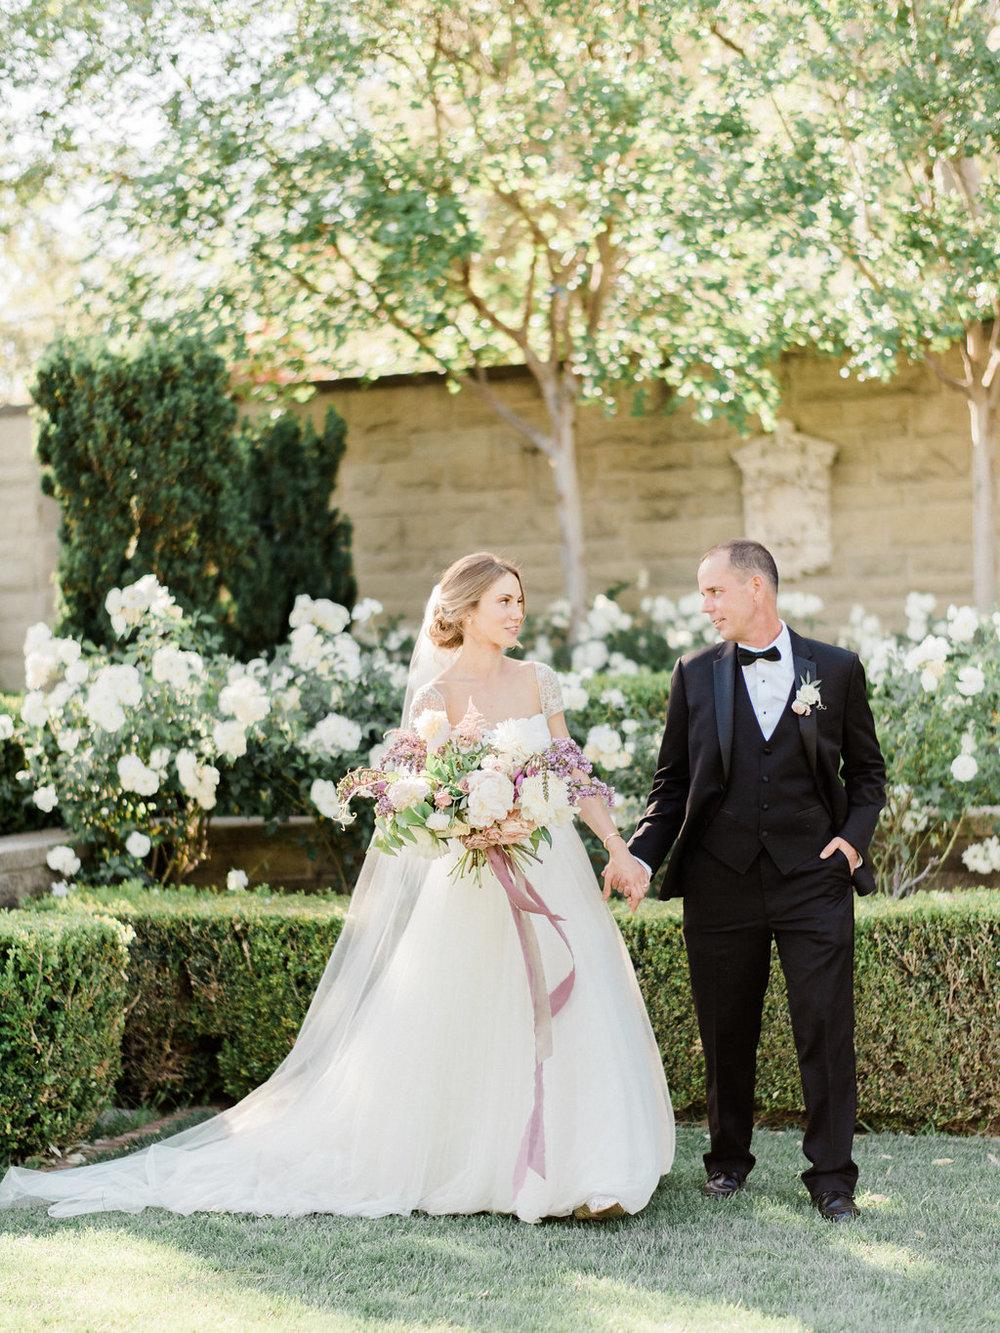 linajaandmichael-wedding-741.jpg